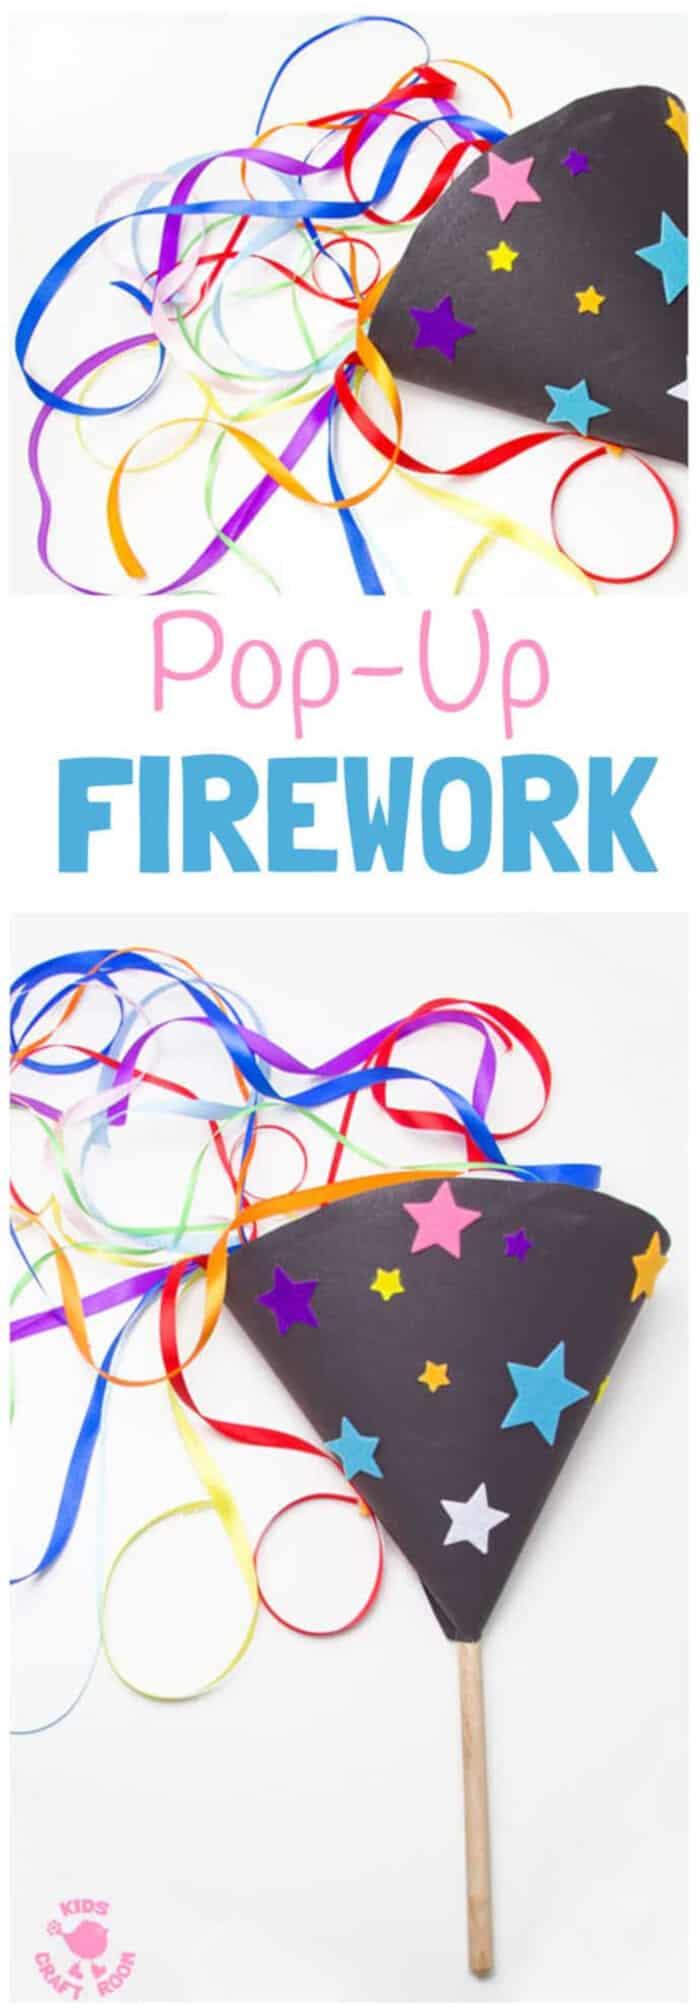 Pop-Up Firework by Kids Craft Room